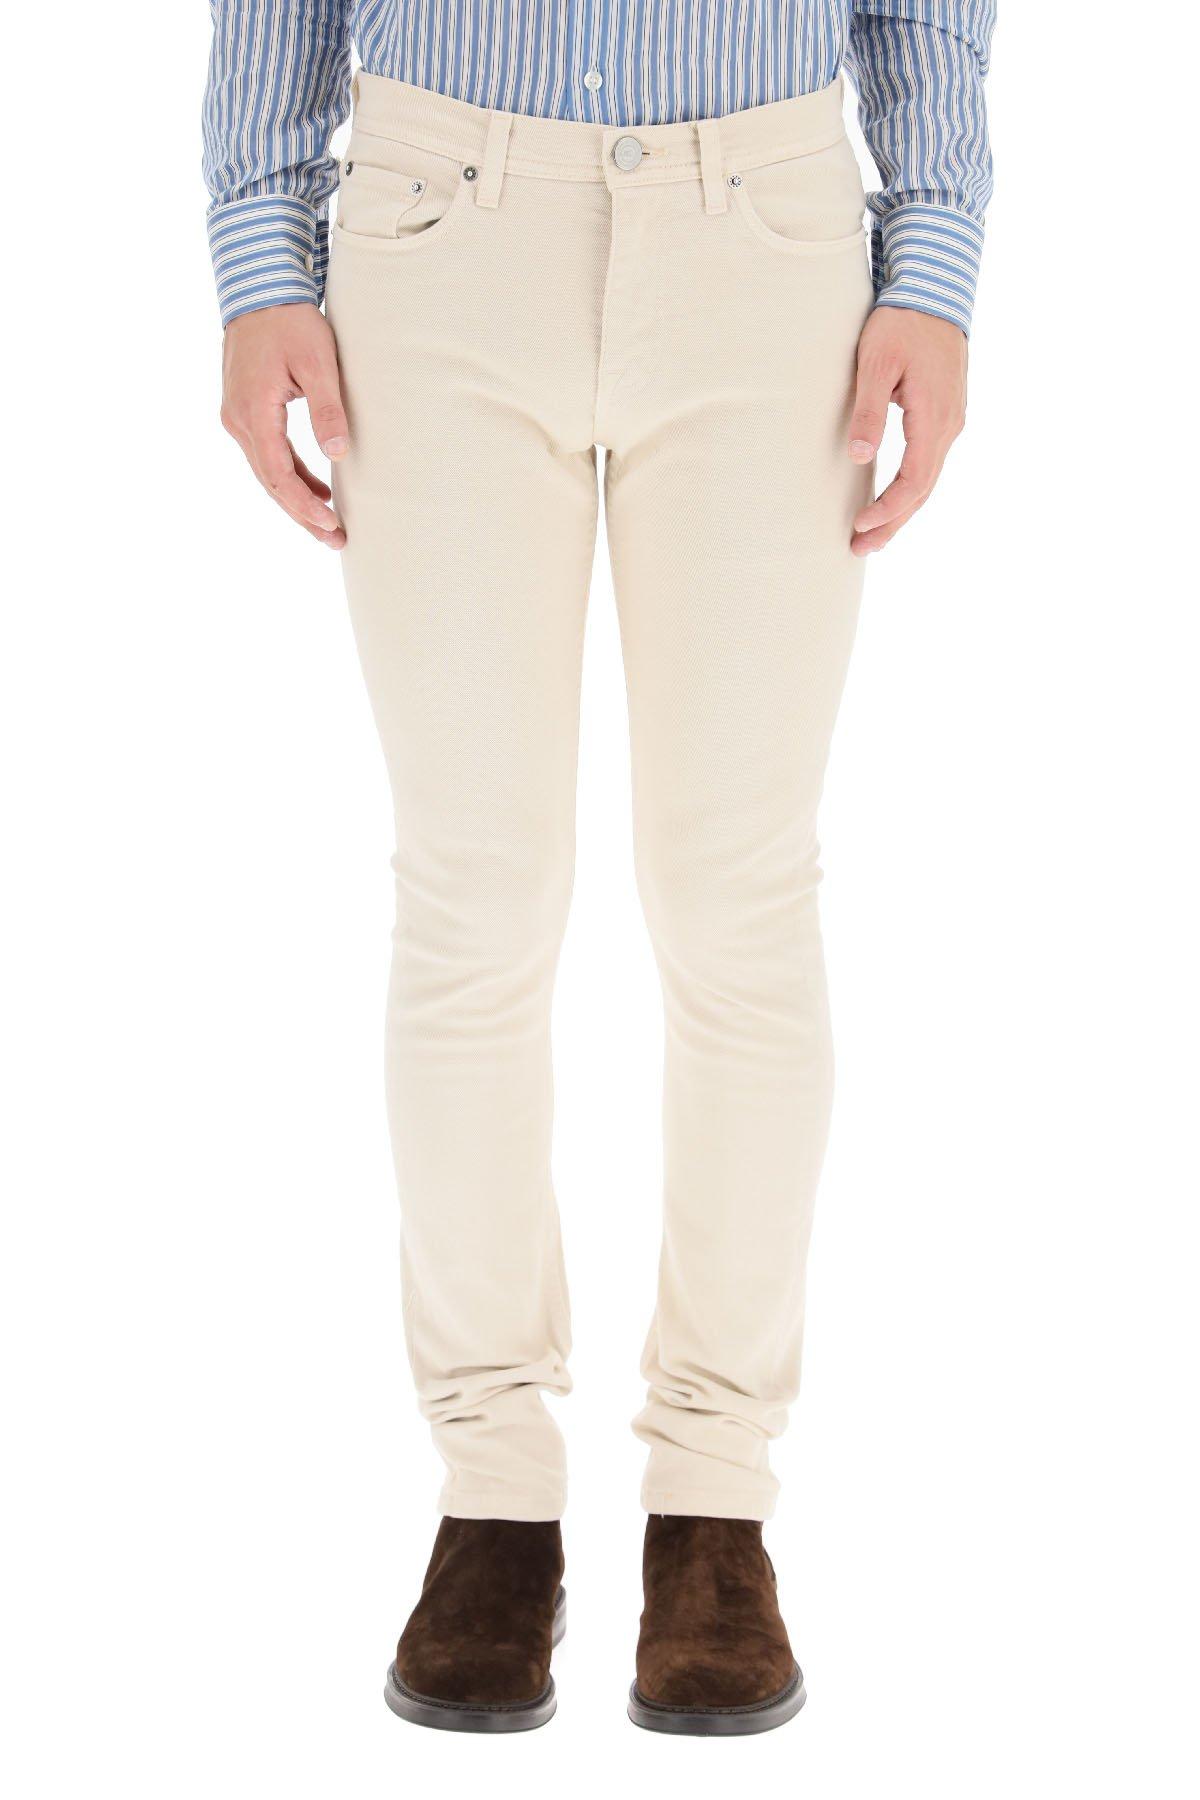 Etro jeans basic slim fit